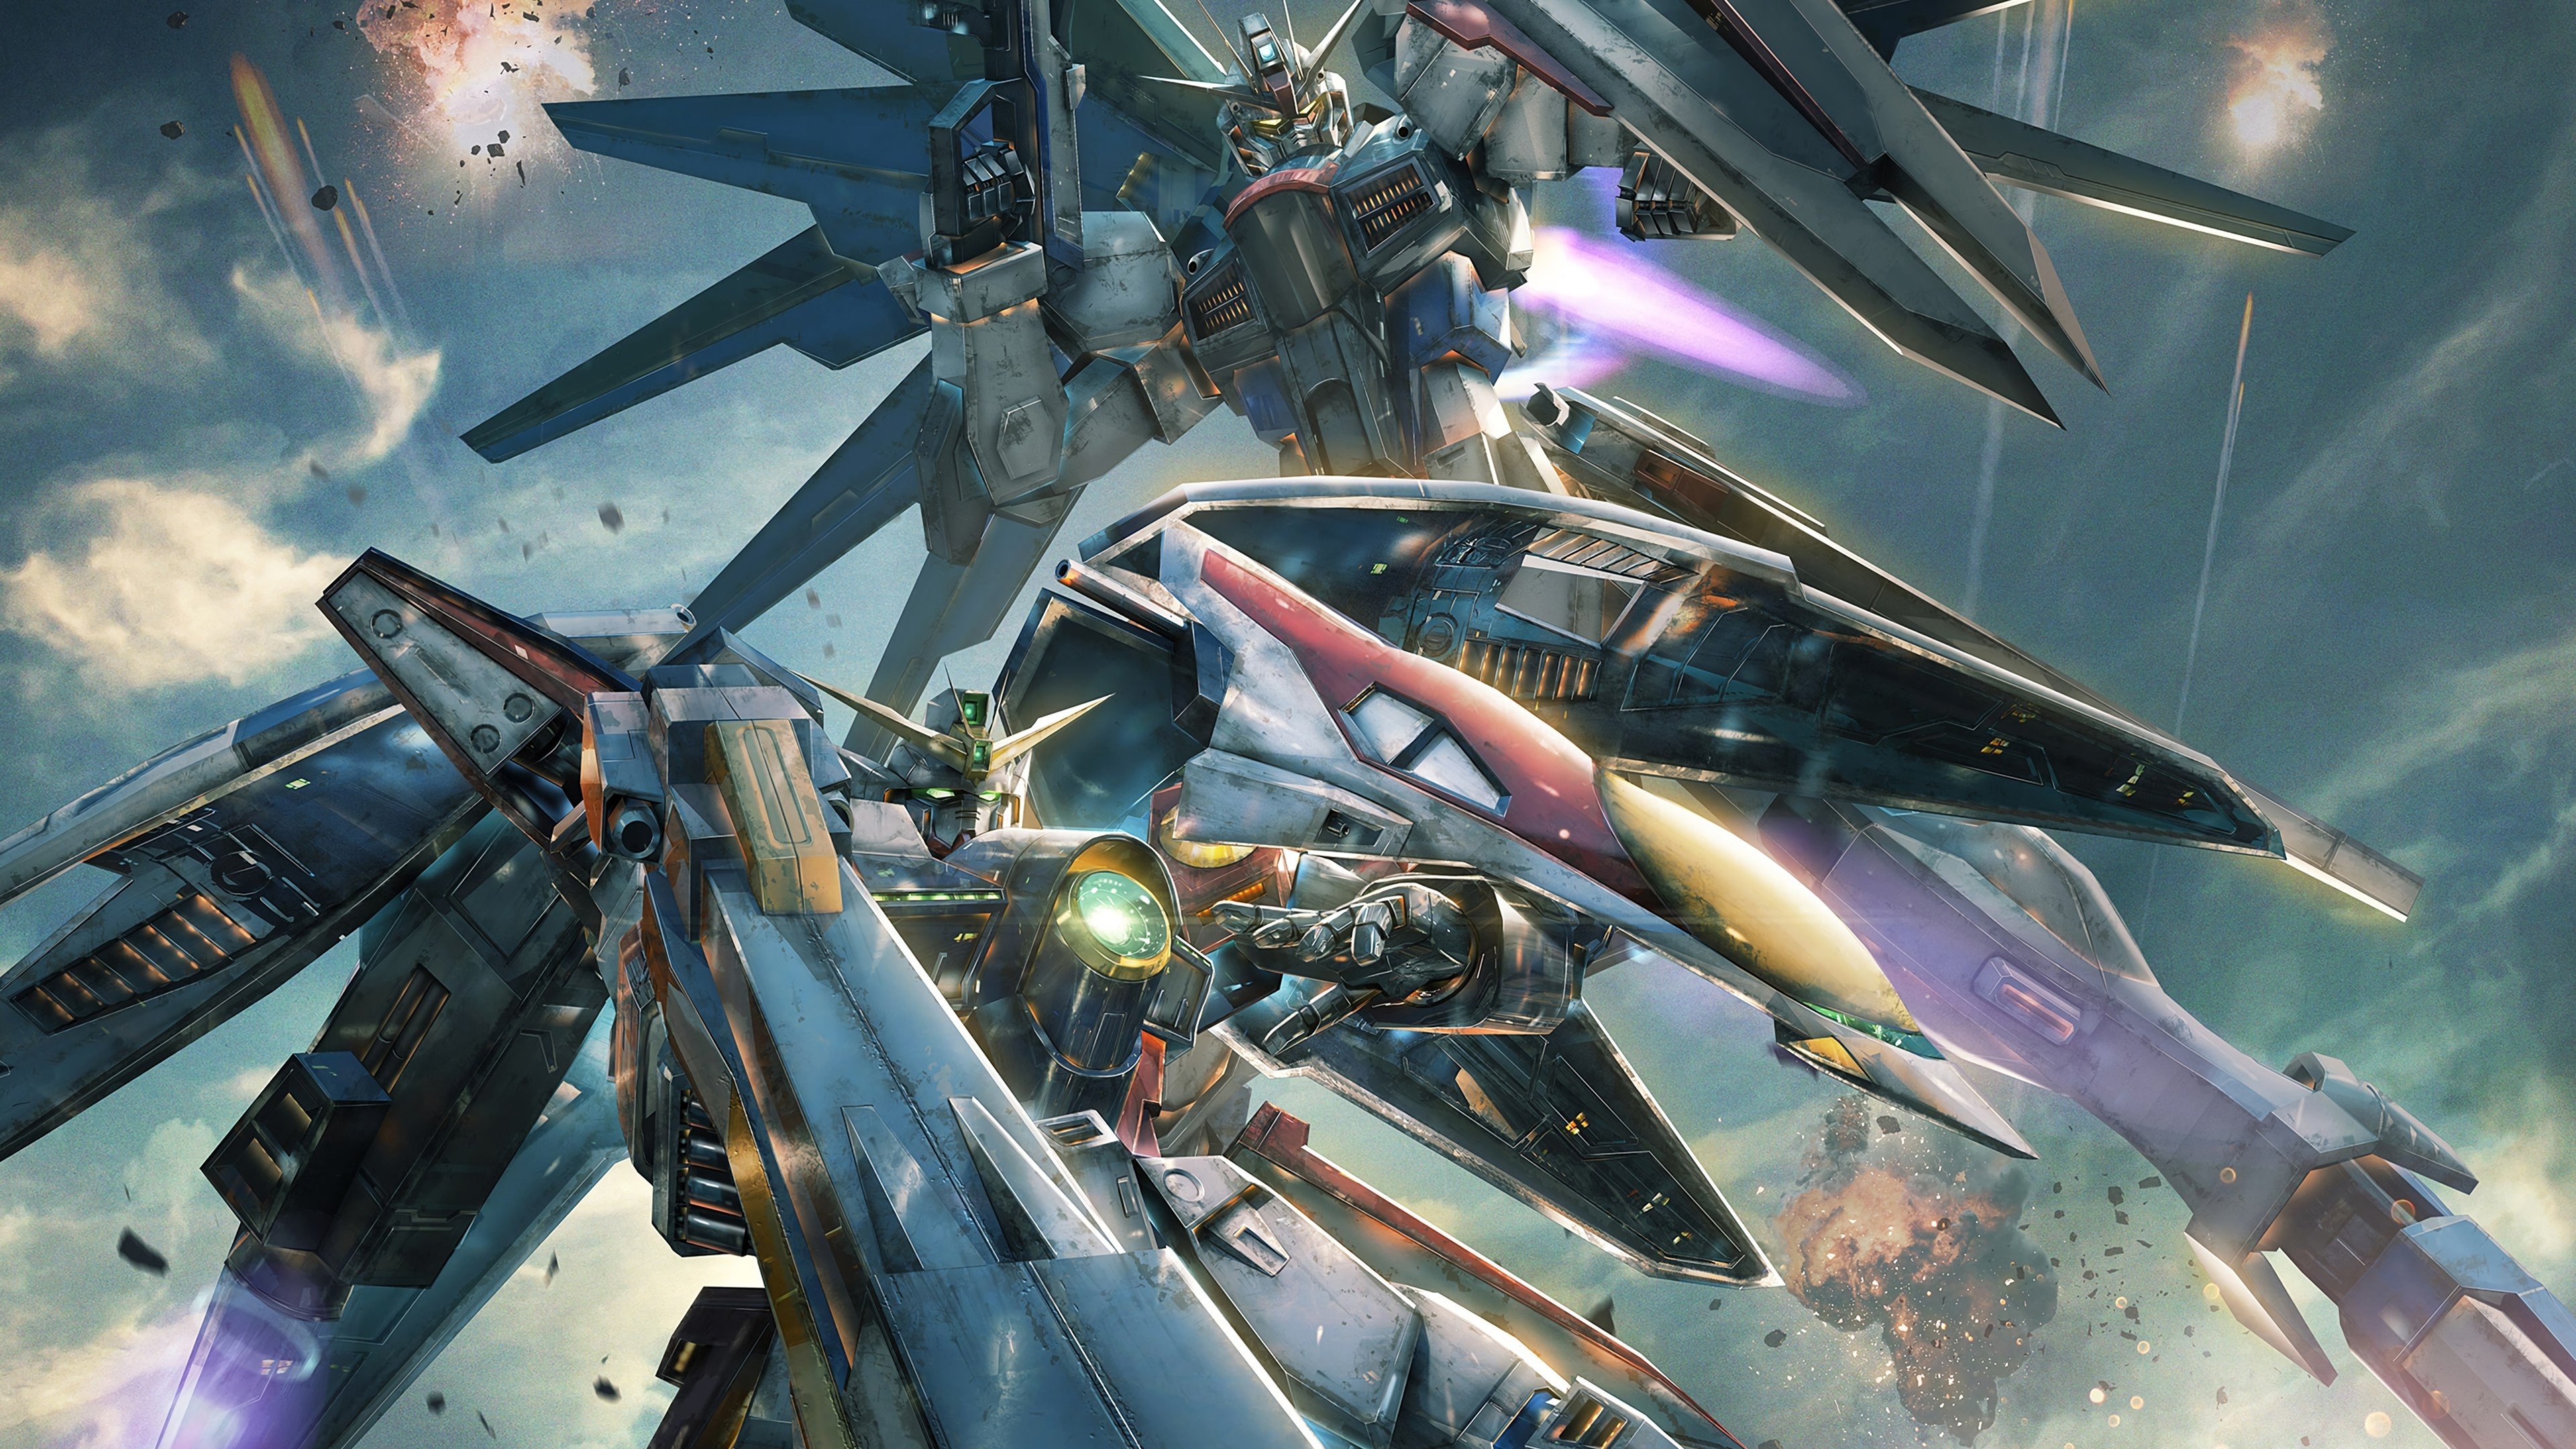 Cool Gundam Versus 4K PlayStation 4 (PS4) Game wallpaper Check  more at http